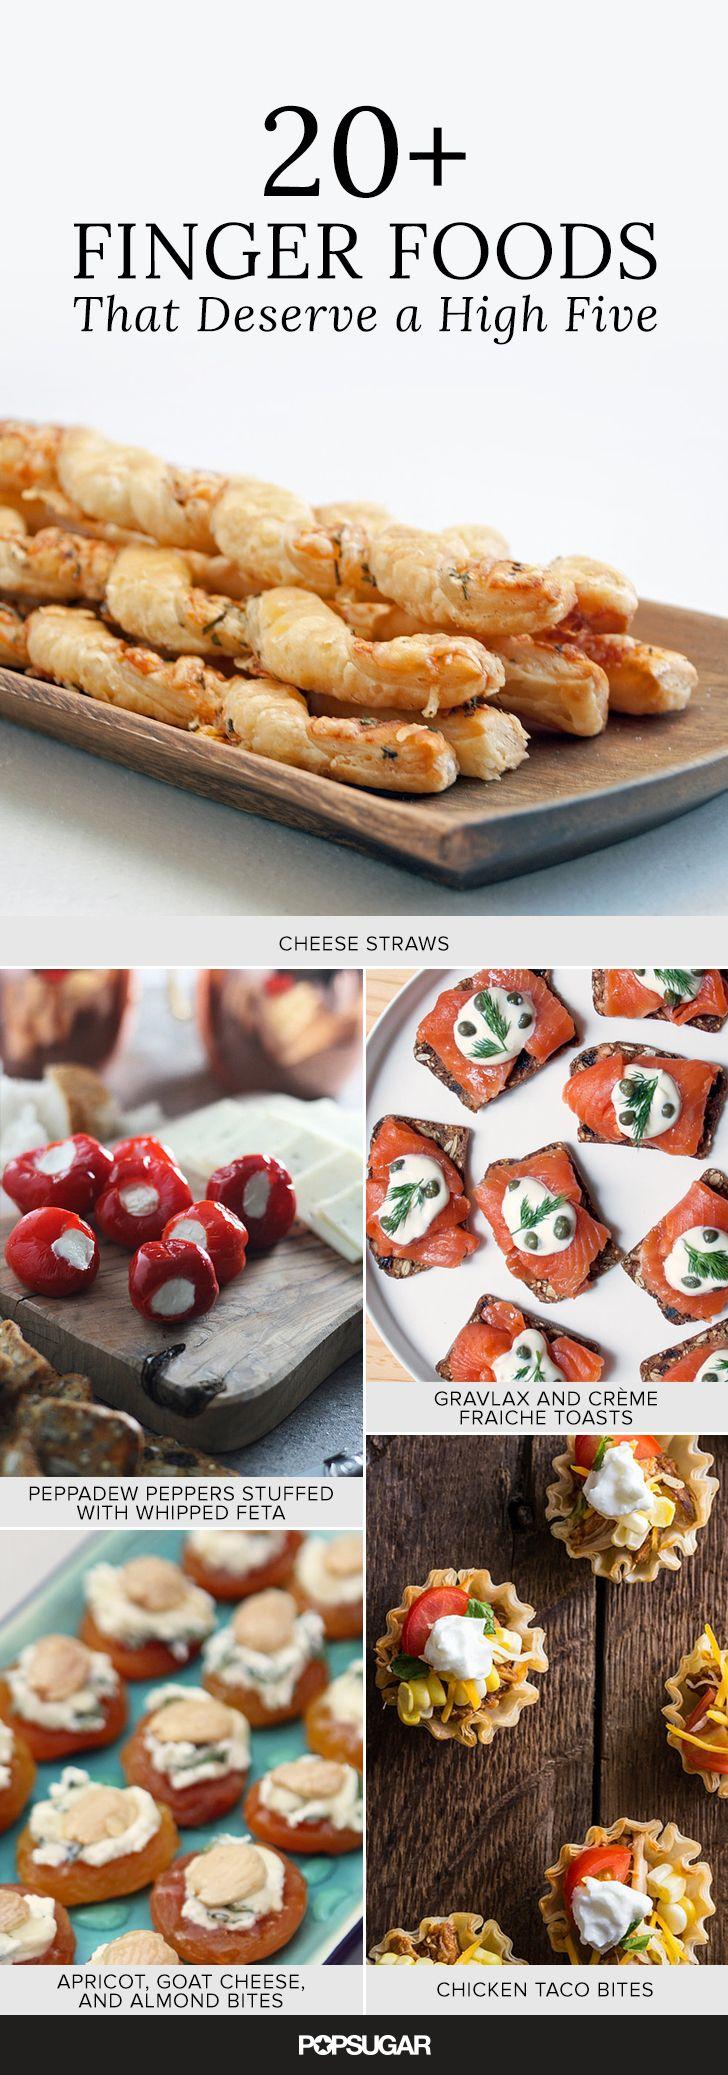 25 finger foods that deserve a high five party food and planning pinterest essen und. Black Bedroom Furniture Sets. Home Design Ideas